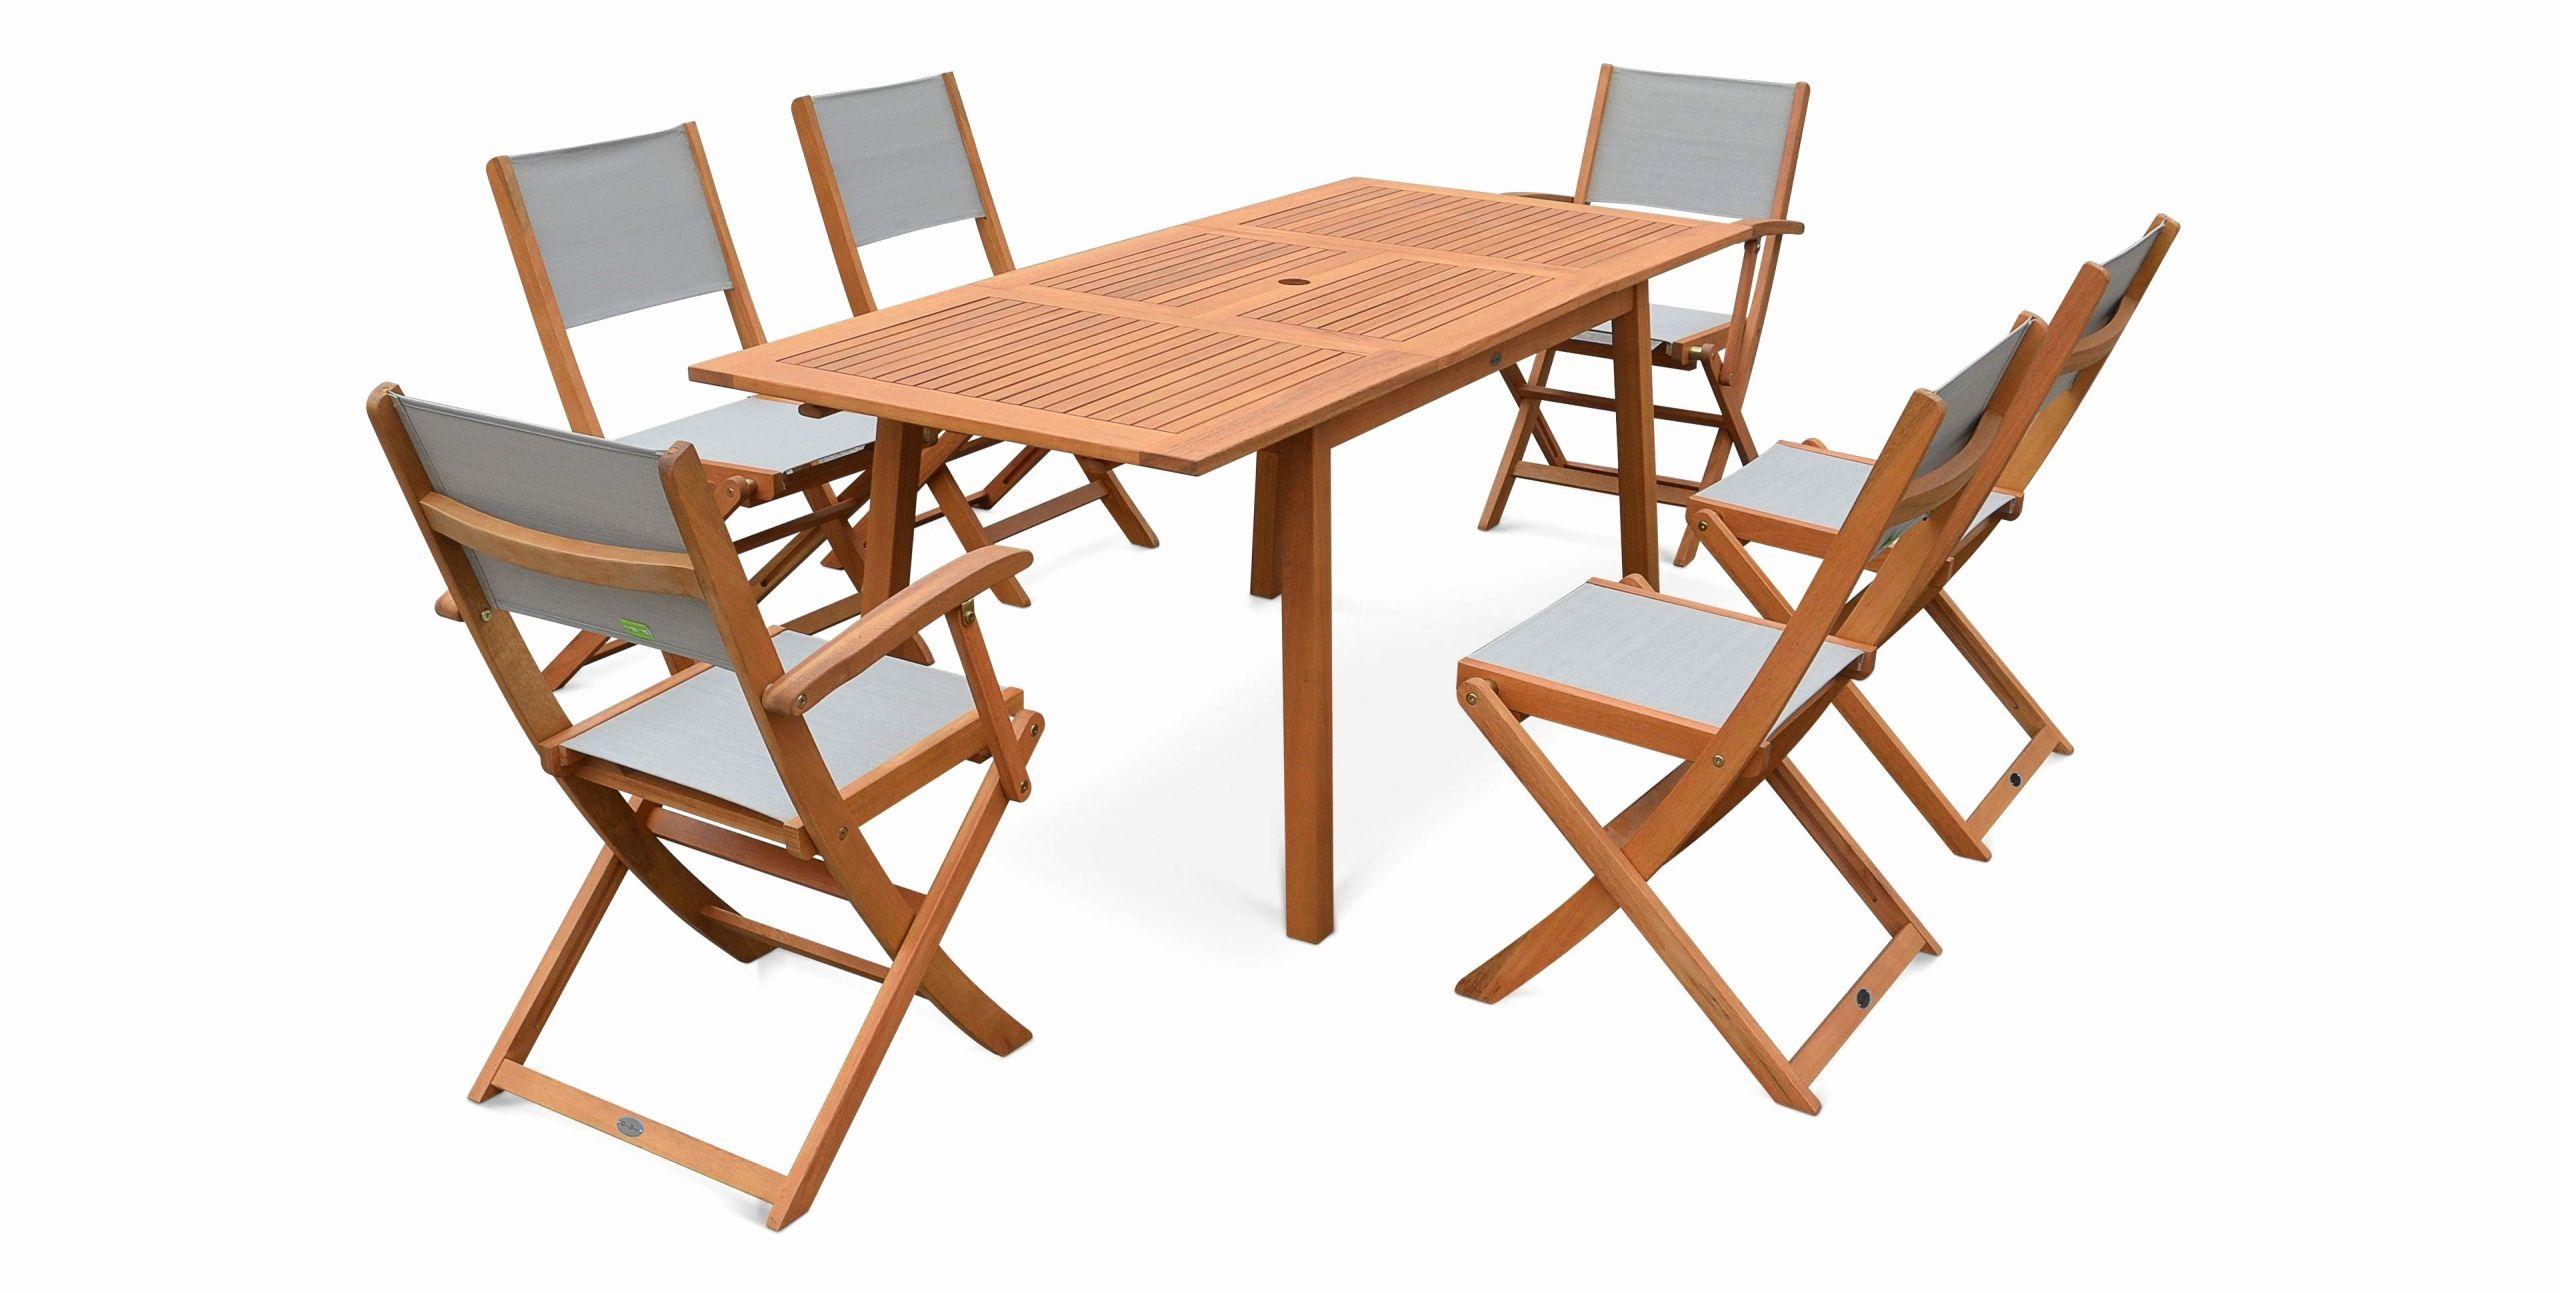 salon de jardin leclerc catalogue 2017 genial jardi leclerc hirsingue luxury 66 frais galerie de table jardin of salon de jardin leclerc catalogue 2017